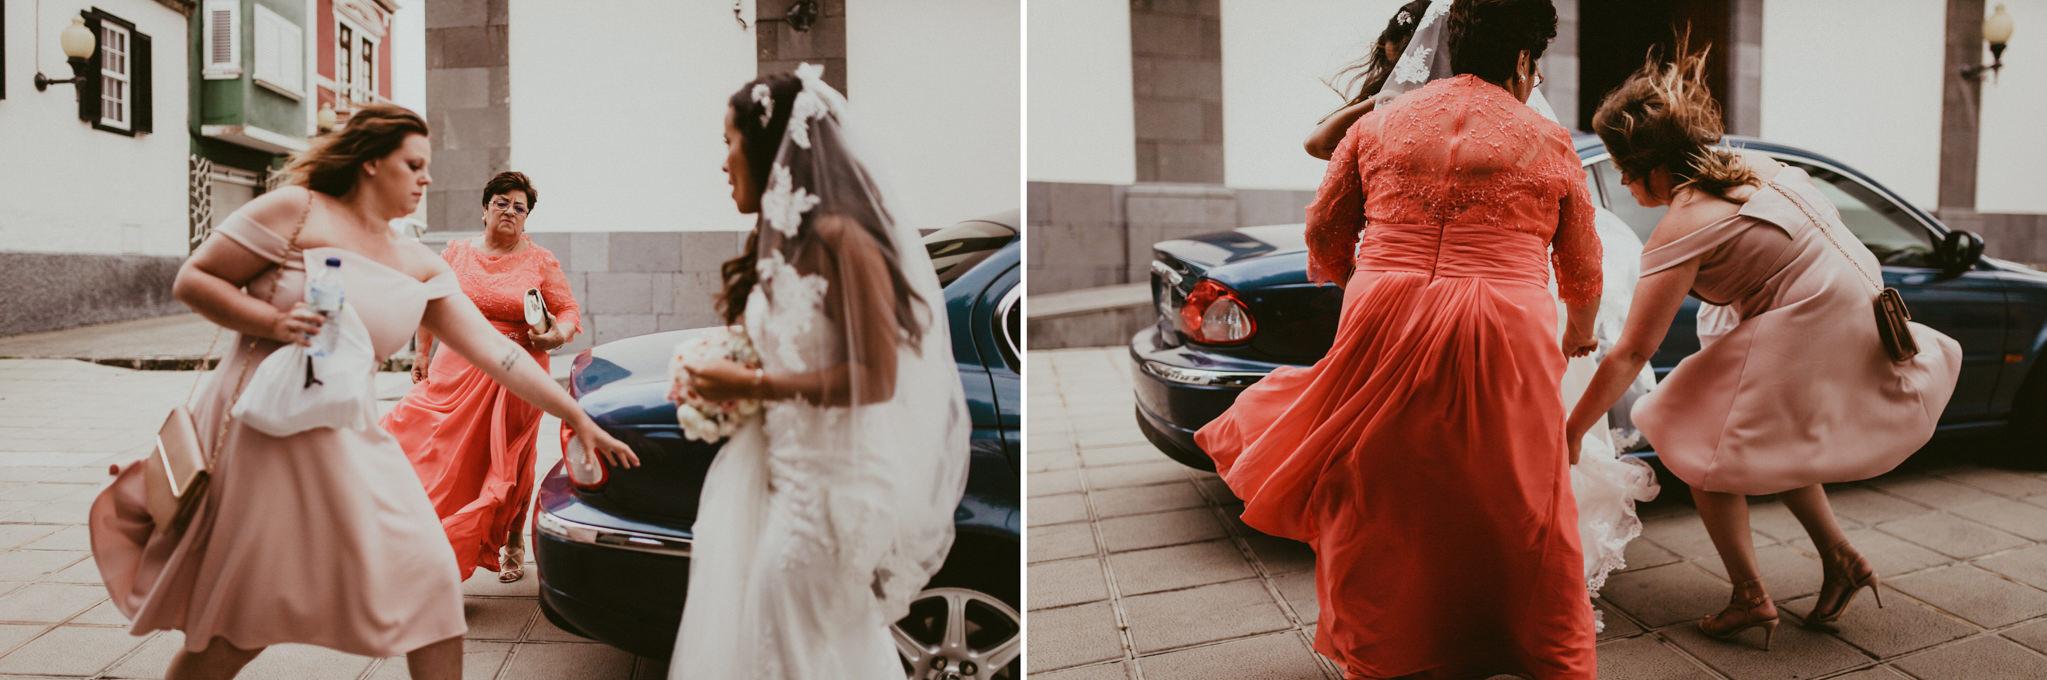 Jessica+Oscar-wedding-137